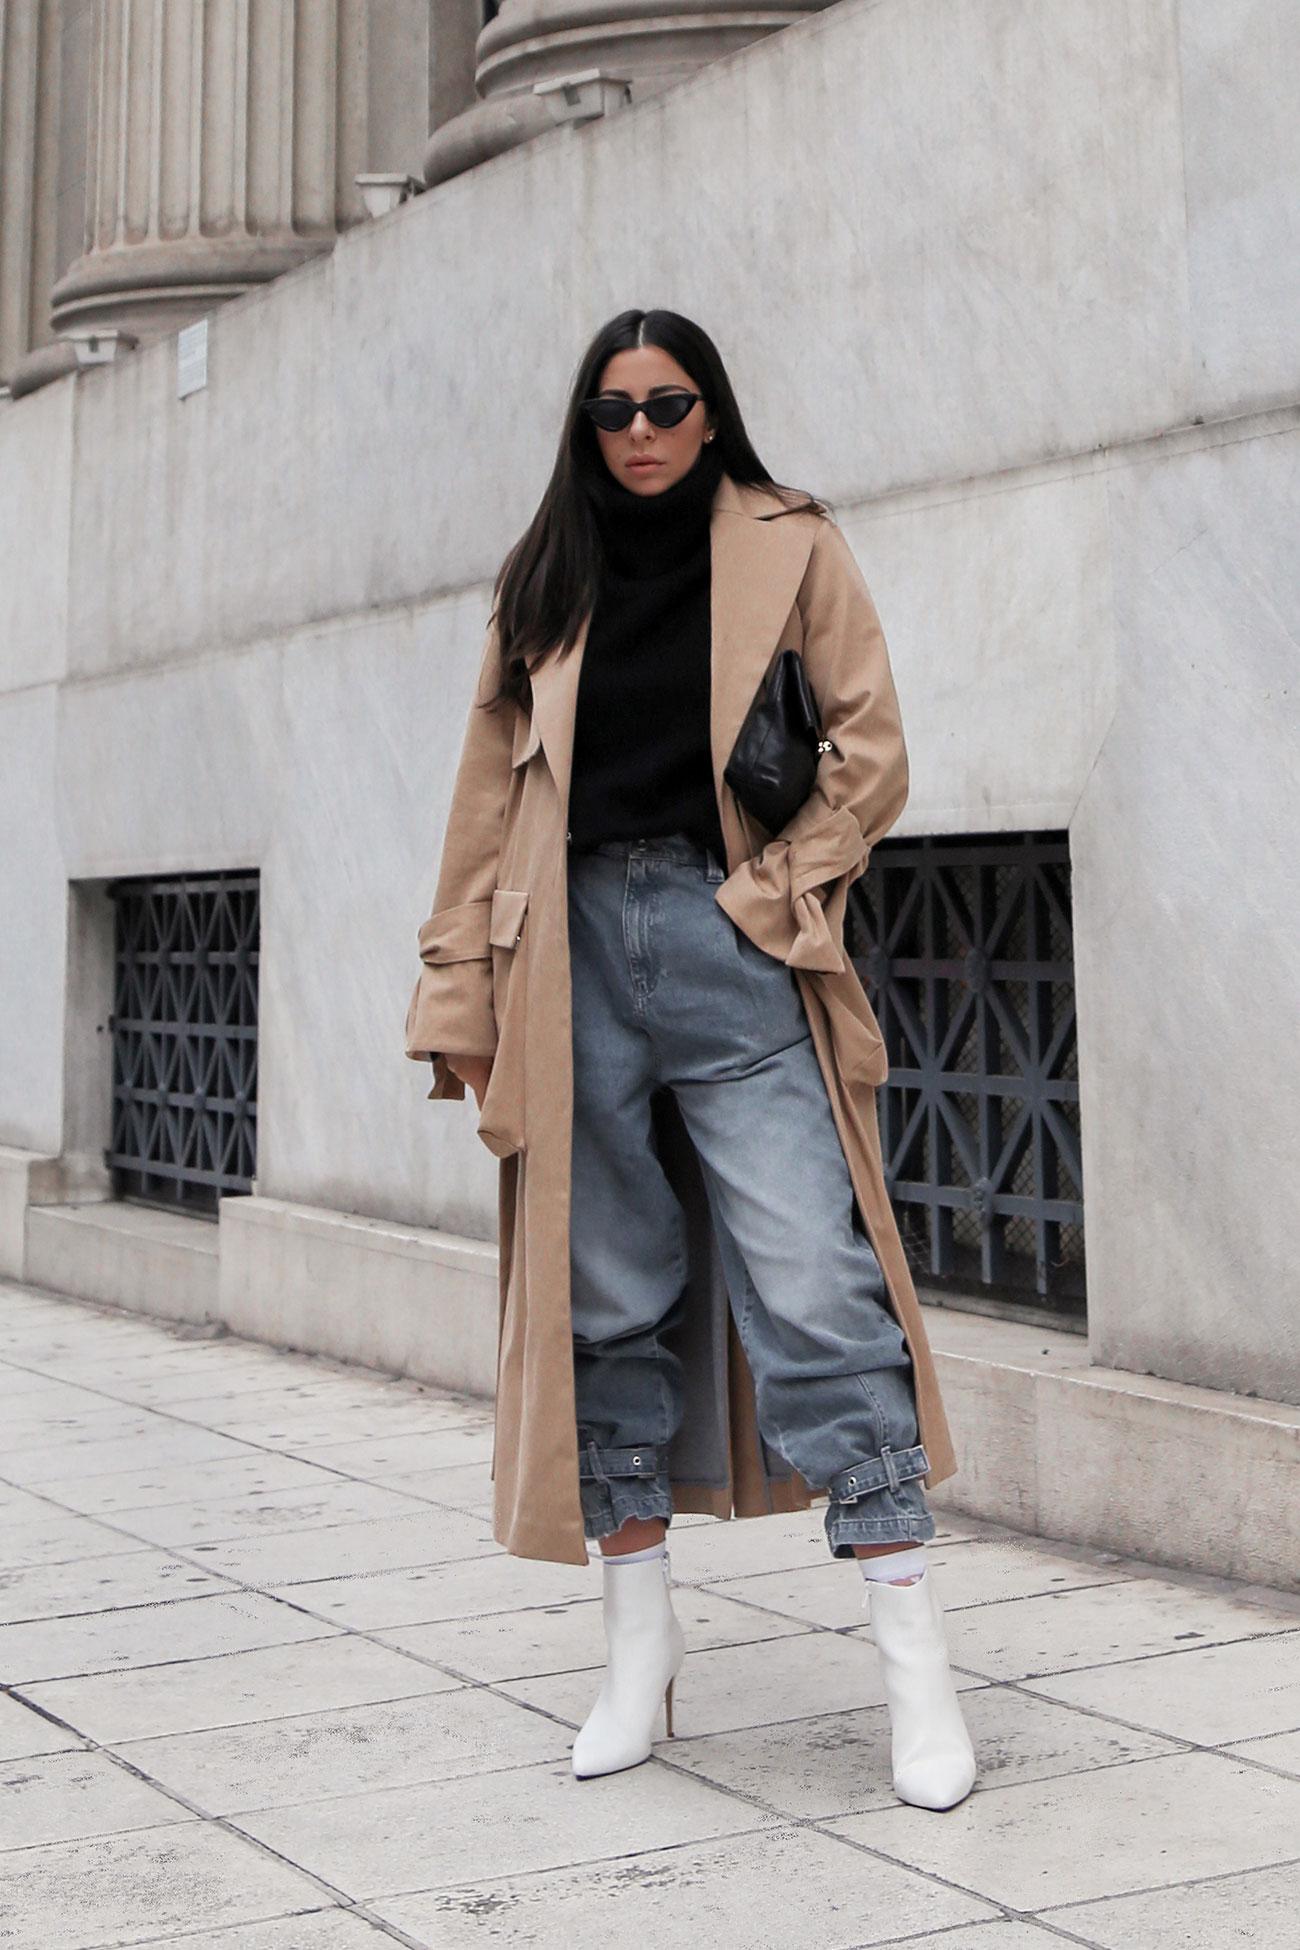 Stella Asteria fashion & lifestyle blogger